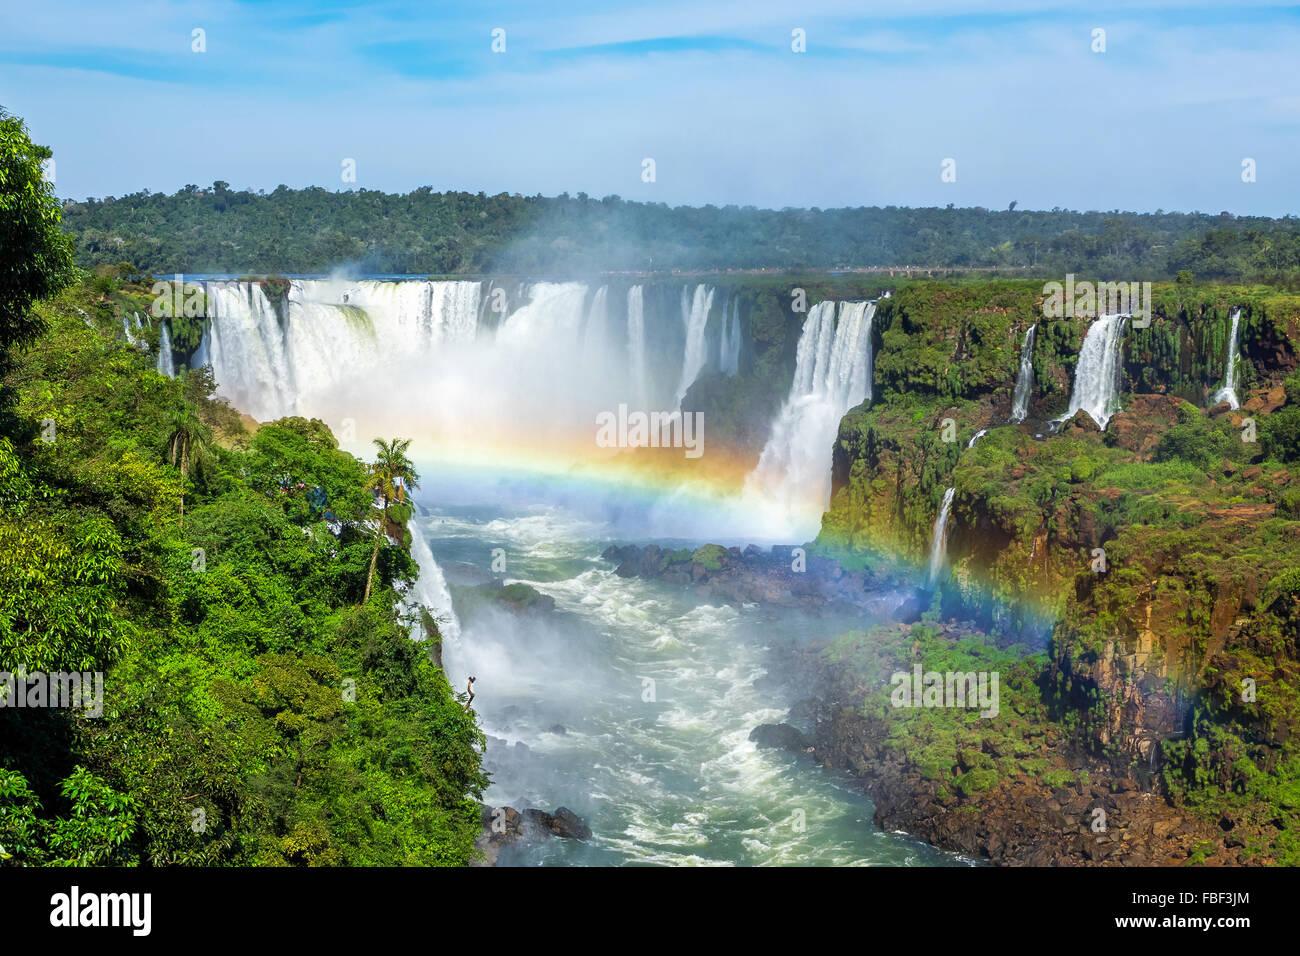 Rainbow at Iguazu Falls, on the border of Argentina and Brazil. - Stock Image